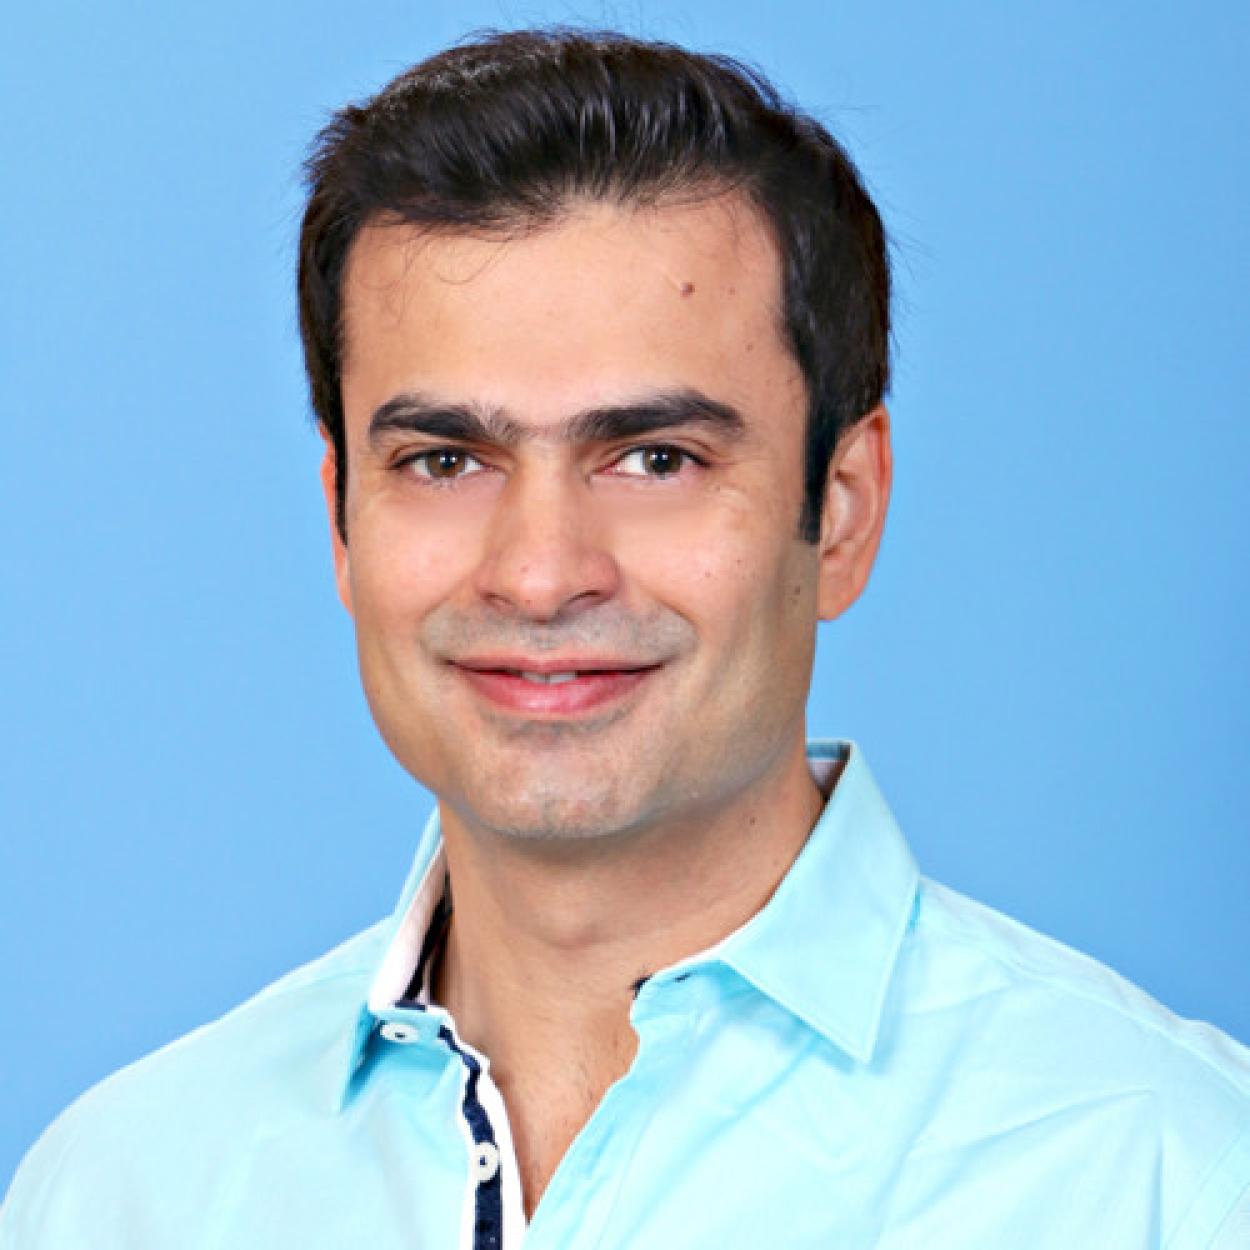 Ibibo founder Ashish Kashyap dons the entrepreneur's hat again